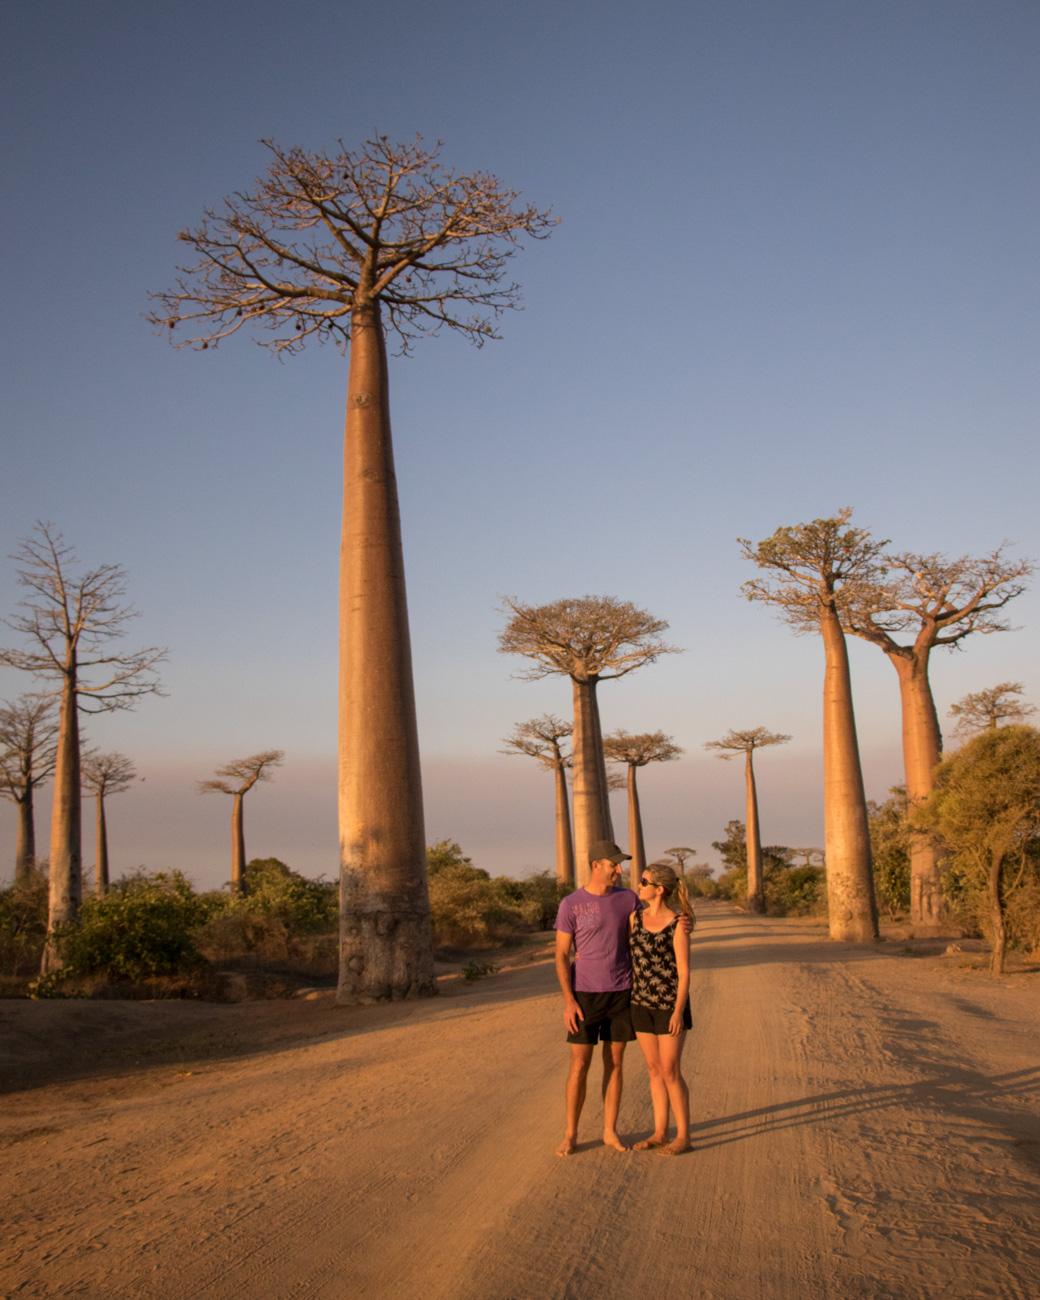 Golden hour at the Alleè Des Baobabs